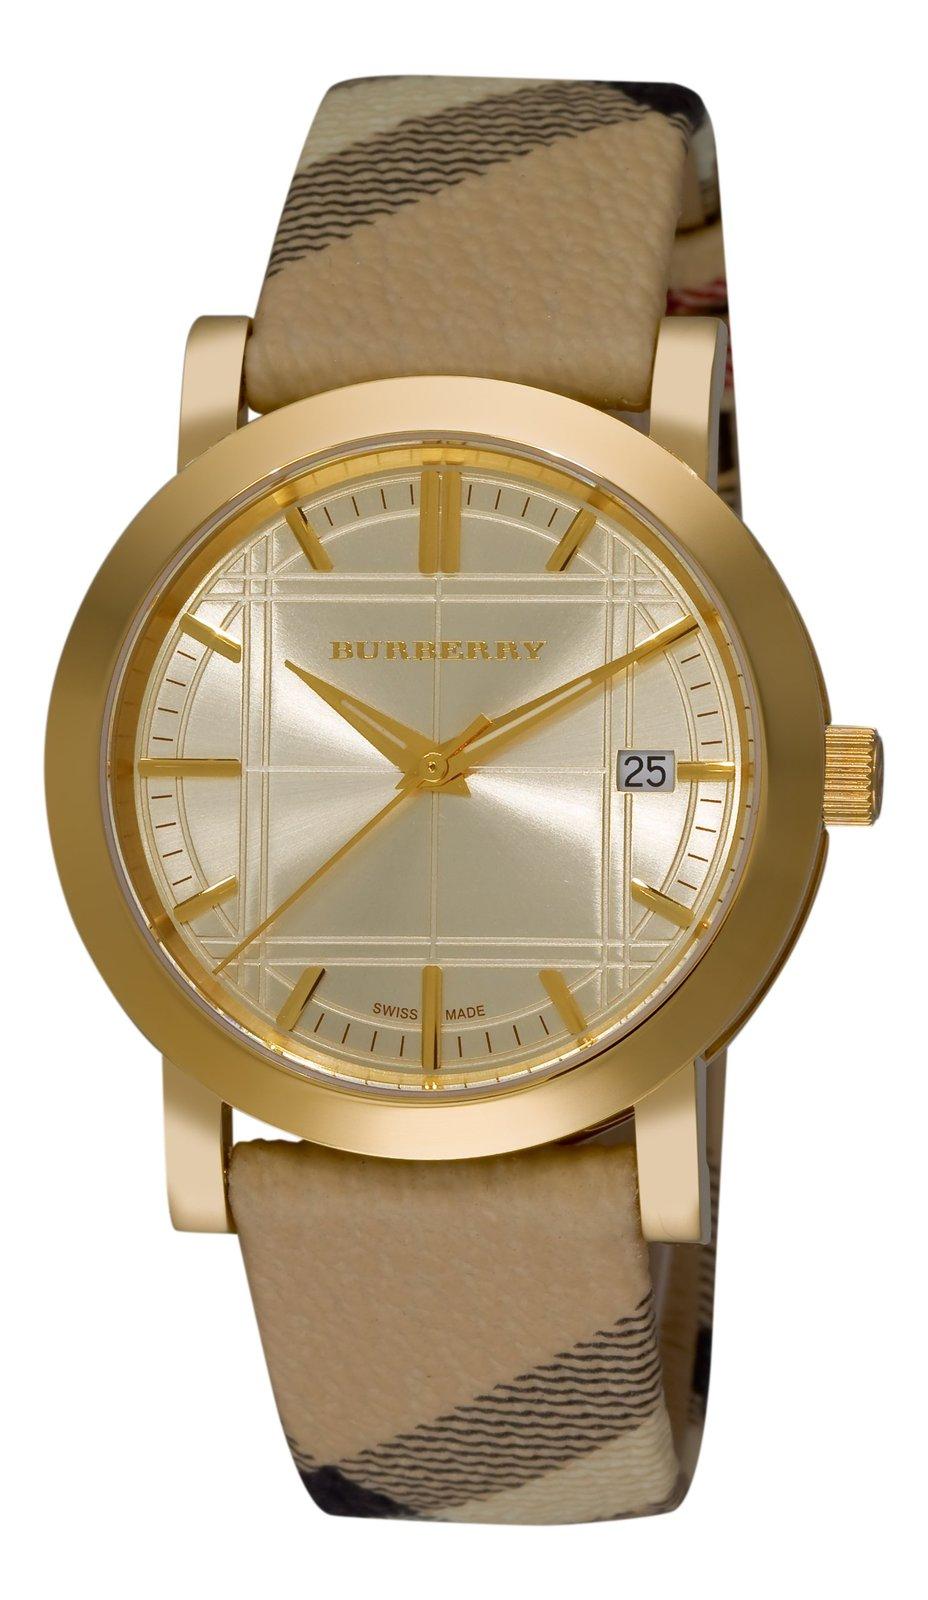 Burberry Women's BU1398 Check Engraved Gold Dial Check Strap Watch